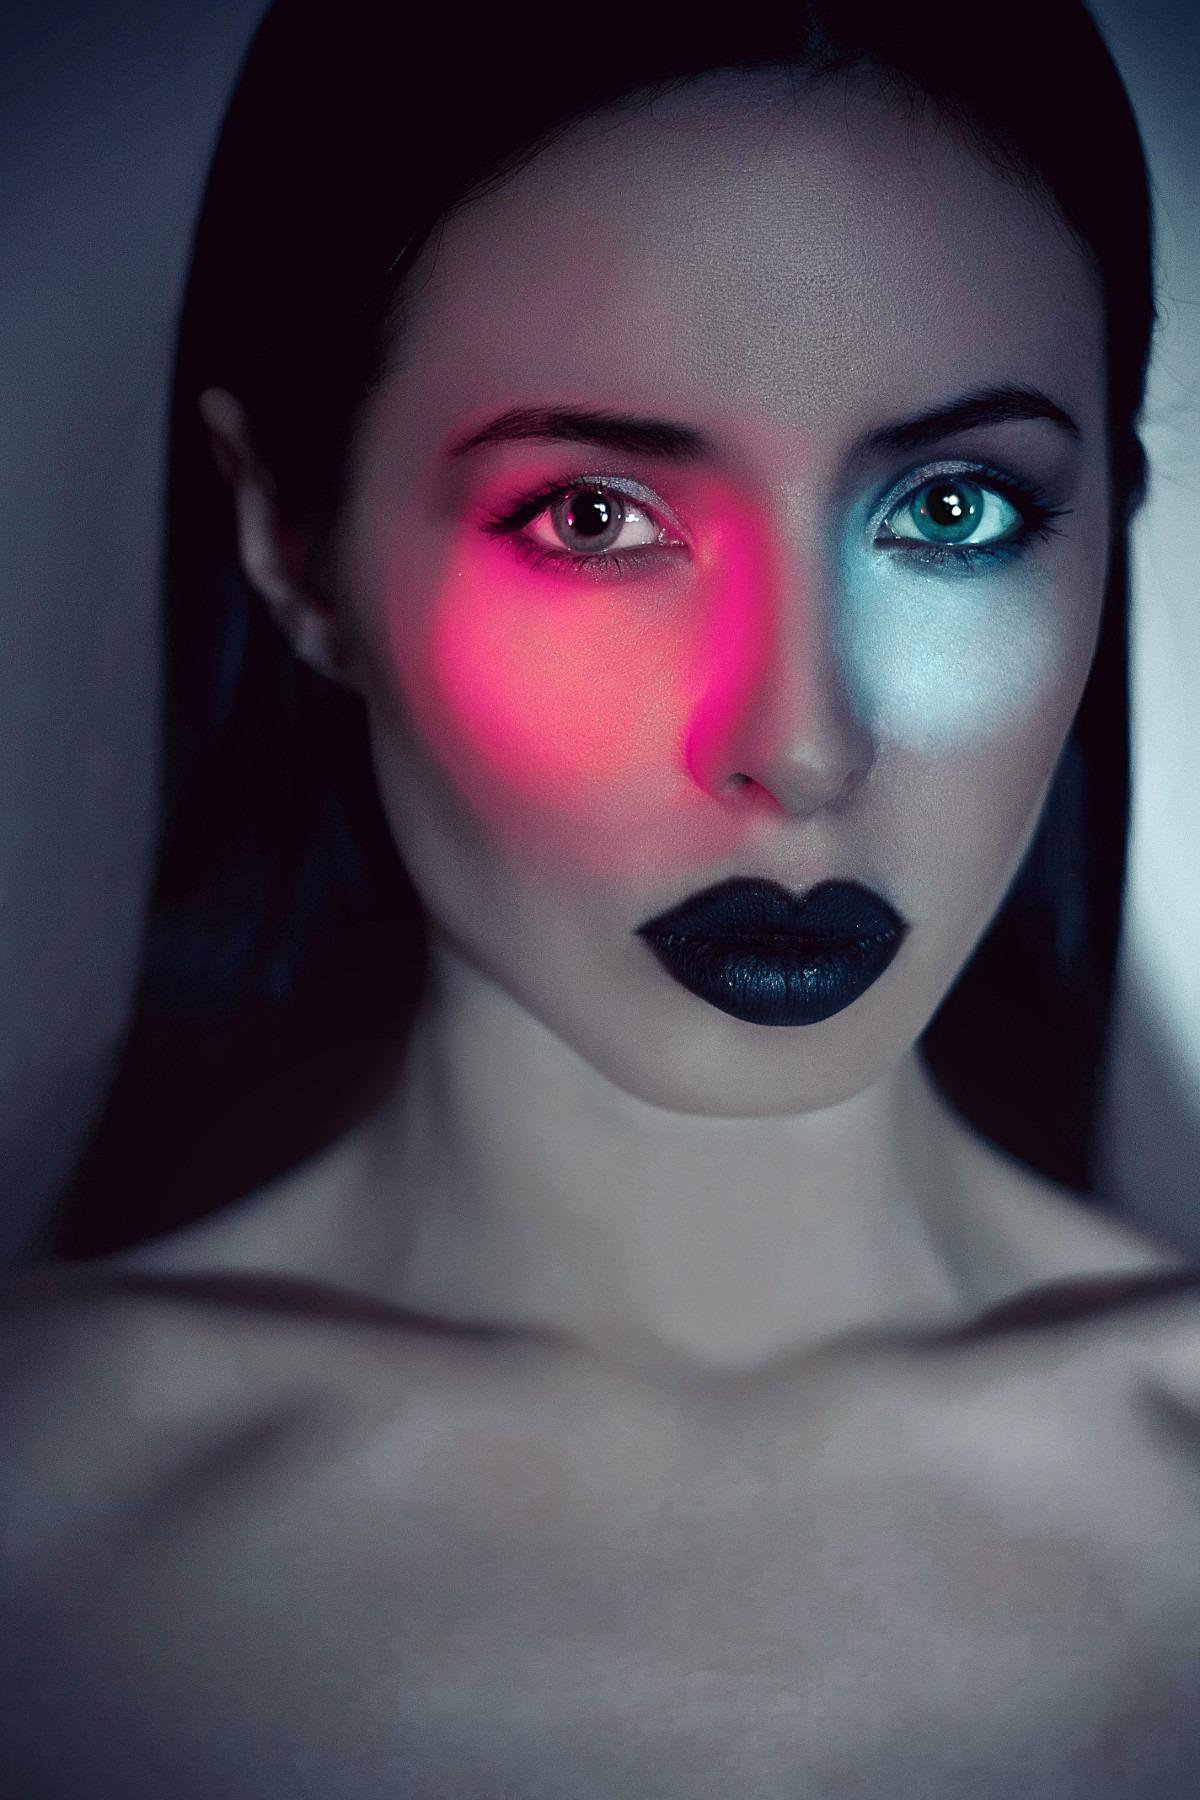 Do women need to wear makeup